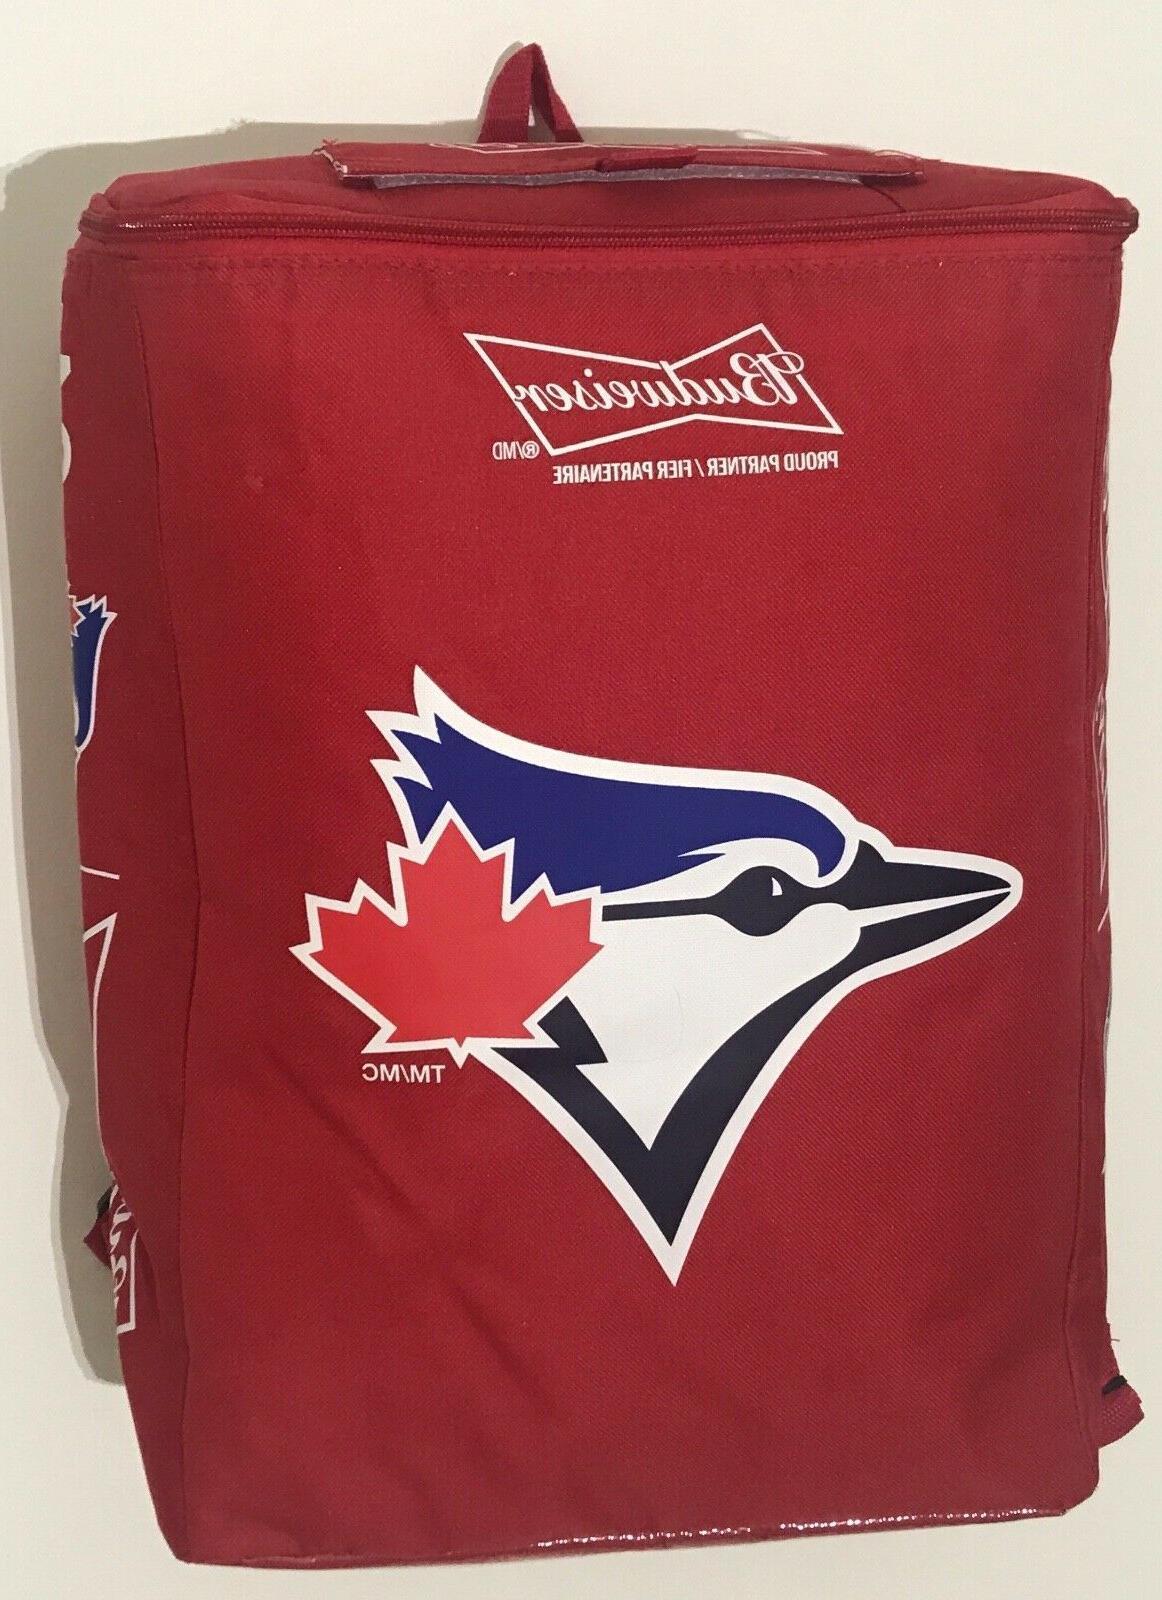 New Budweiser MLB Backpack 24